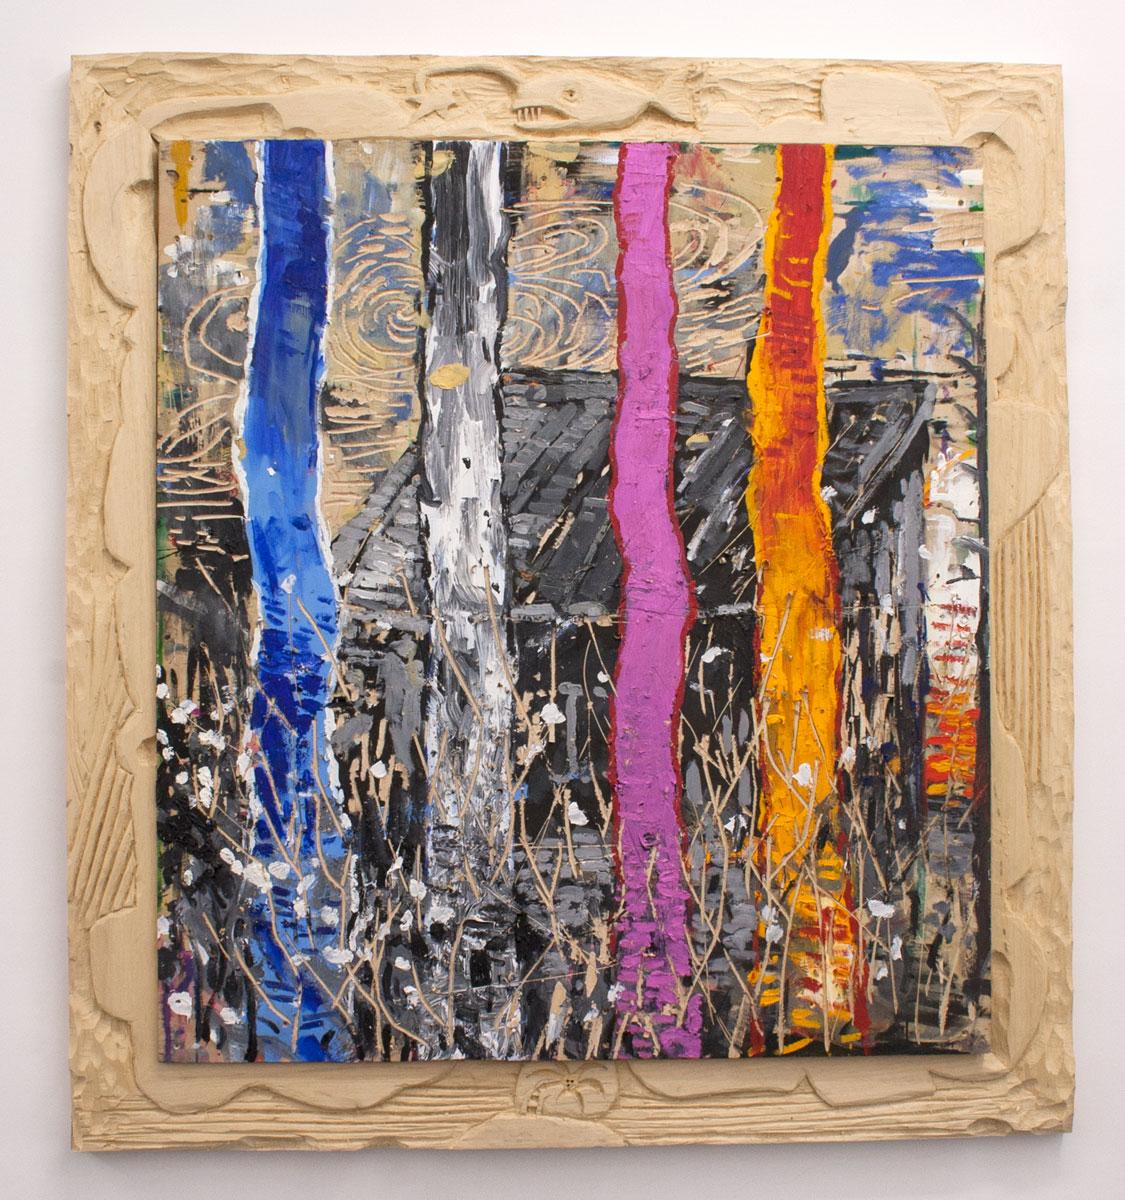 Abraham Lacalle. ABISAL, 2016. Óleo sobre madera y marco intervenido. 147 x 135 cm